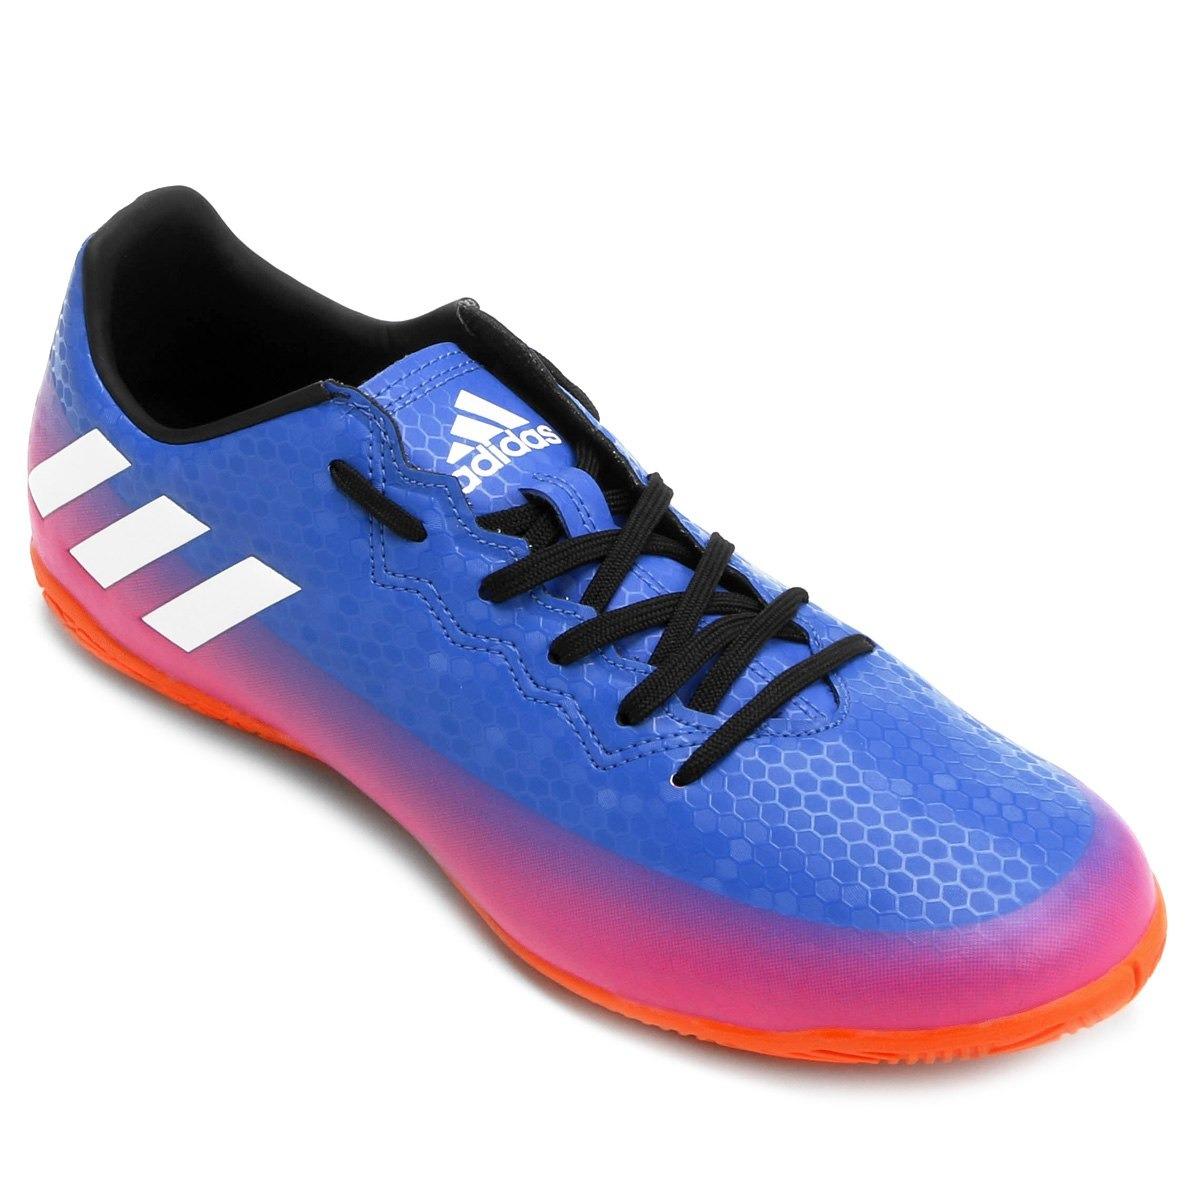 aebfd1bddbe4c chuteira futsal adidas messi 16.4 in masculino - azul/pink. Carregando zoom.